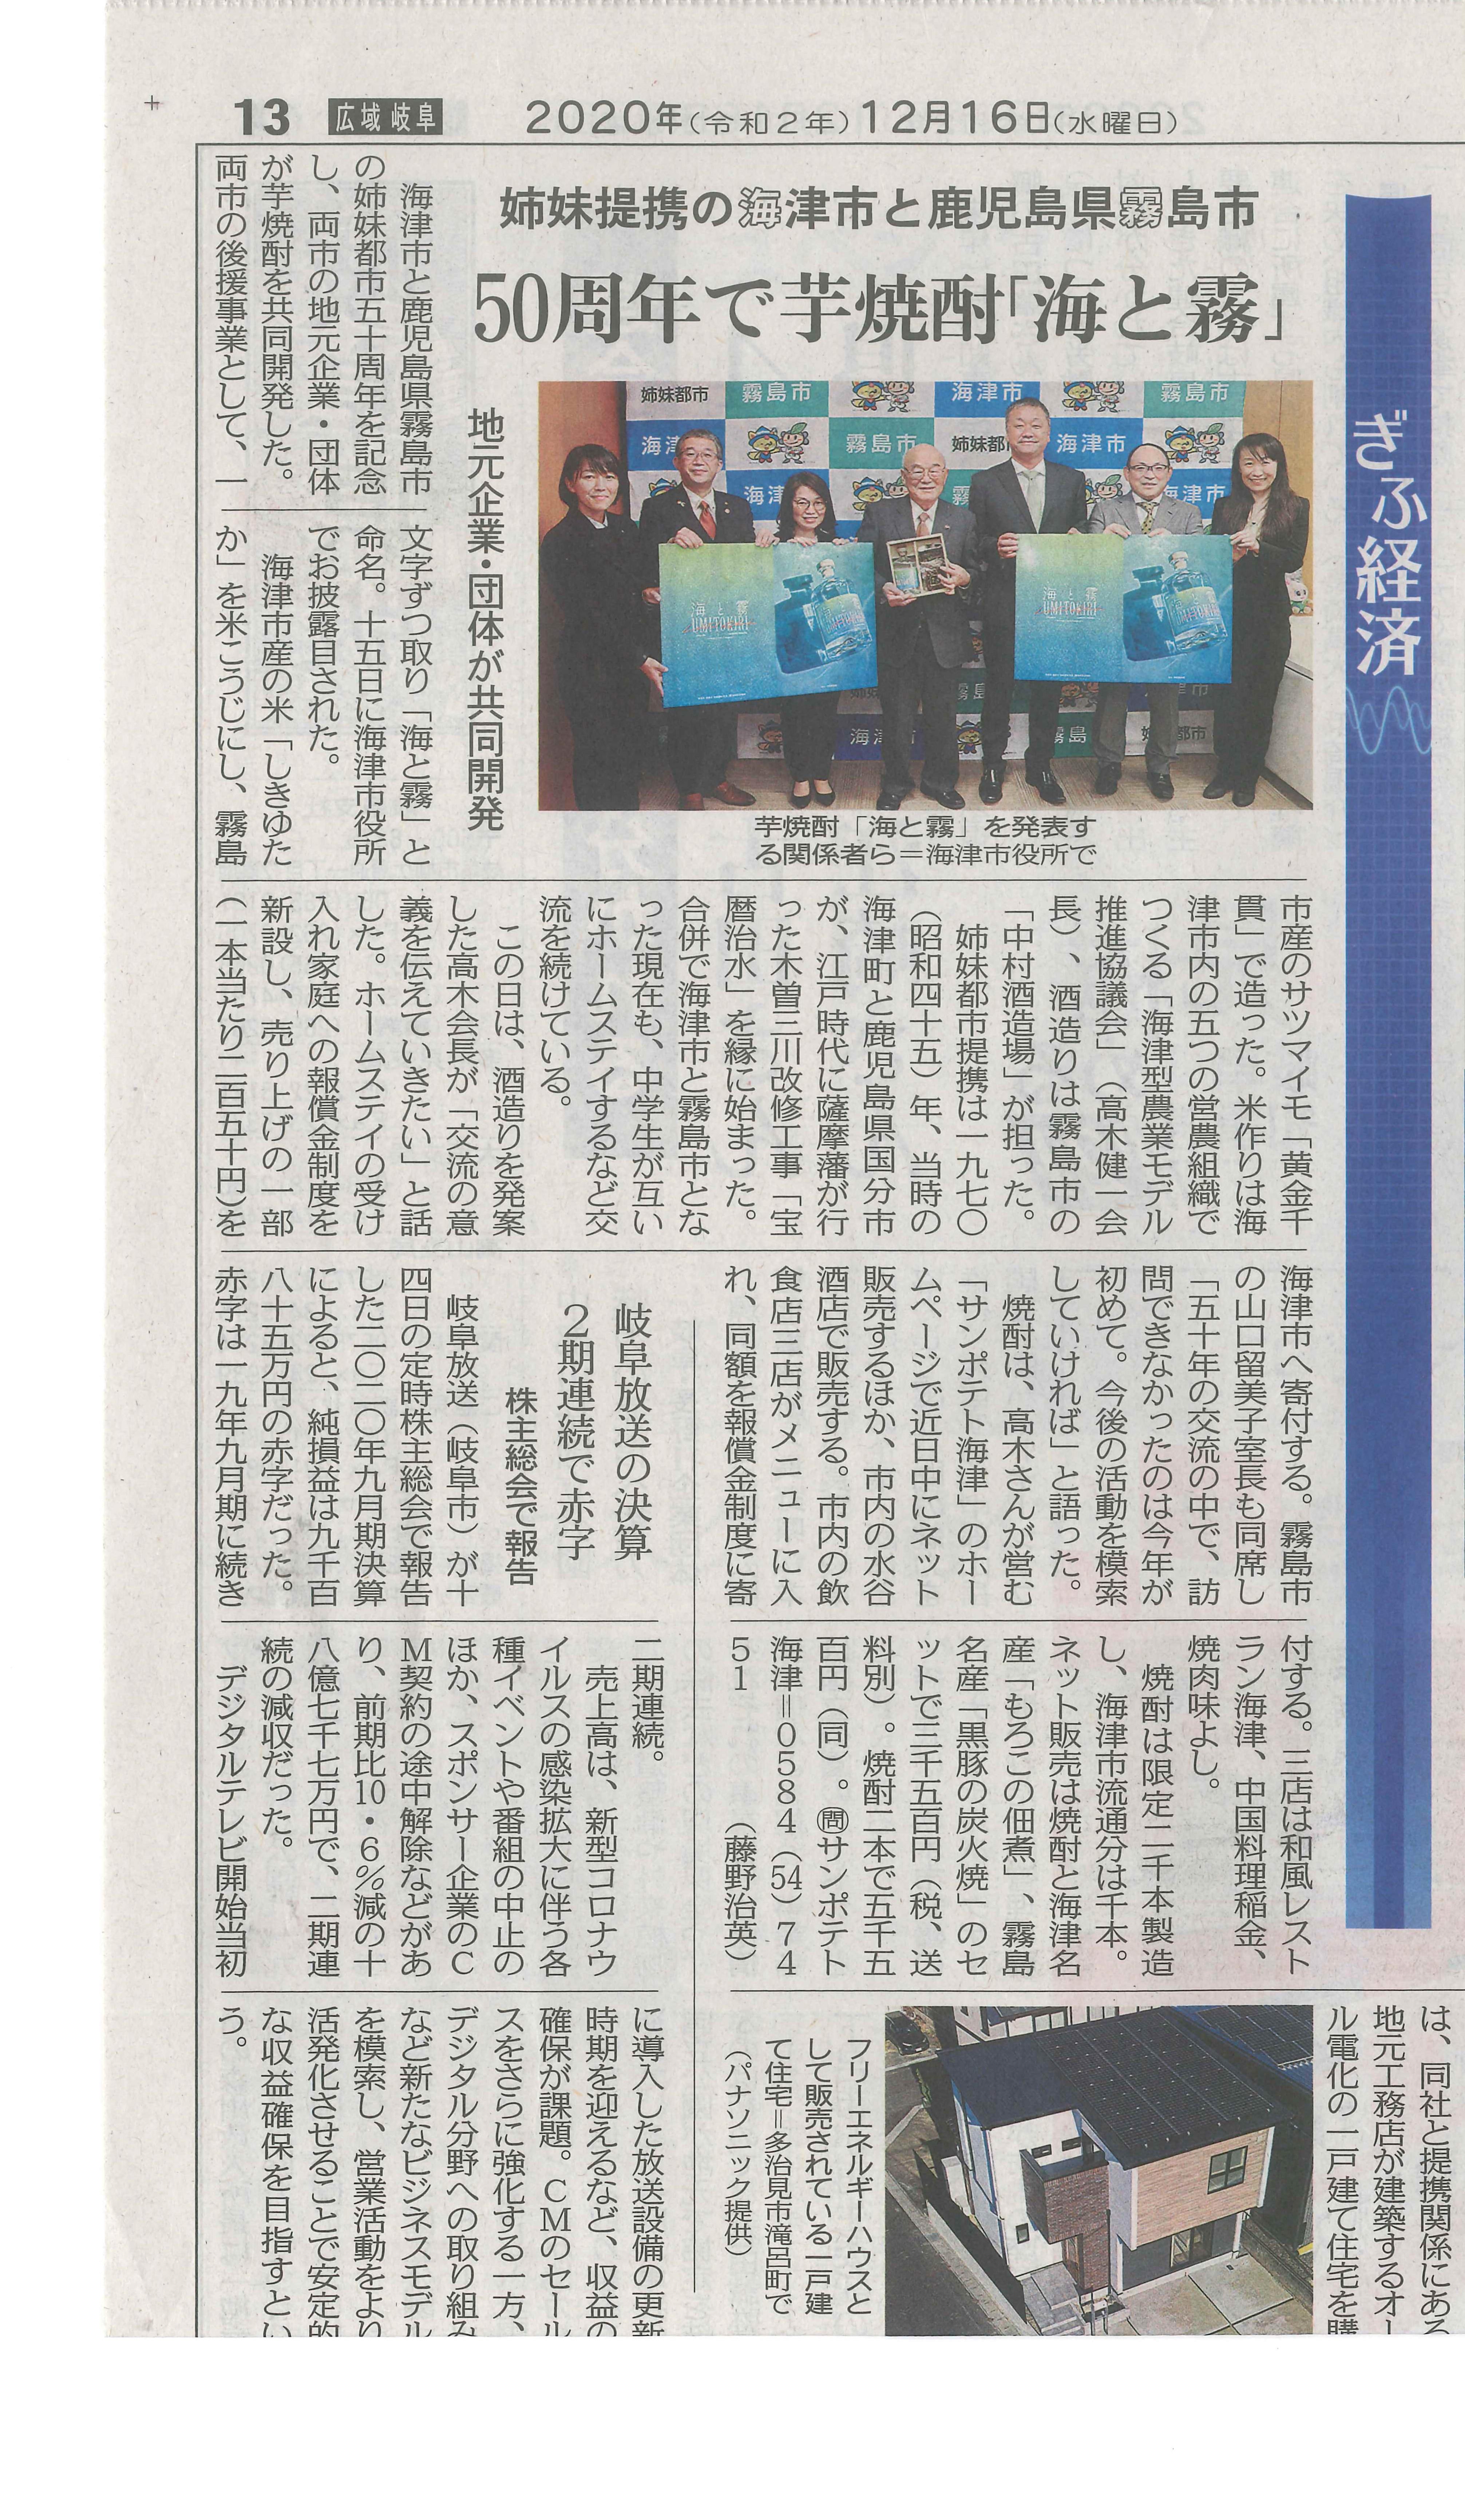 50周年記念で芋焼酎「海と霧」発売